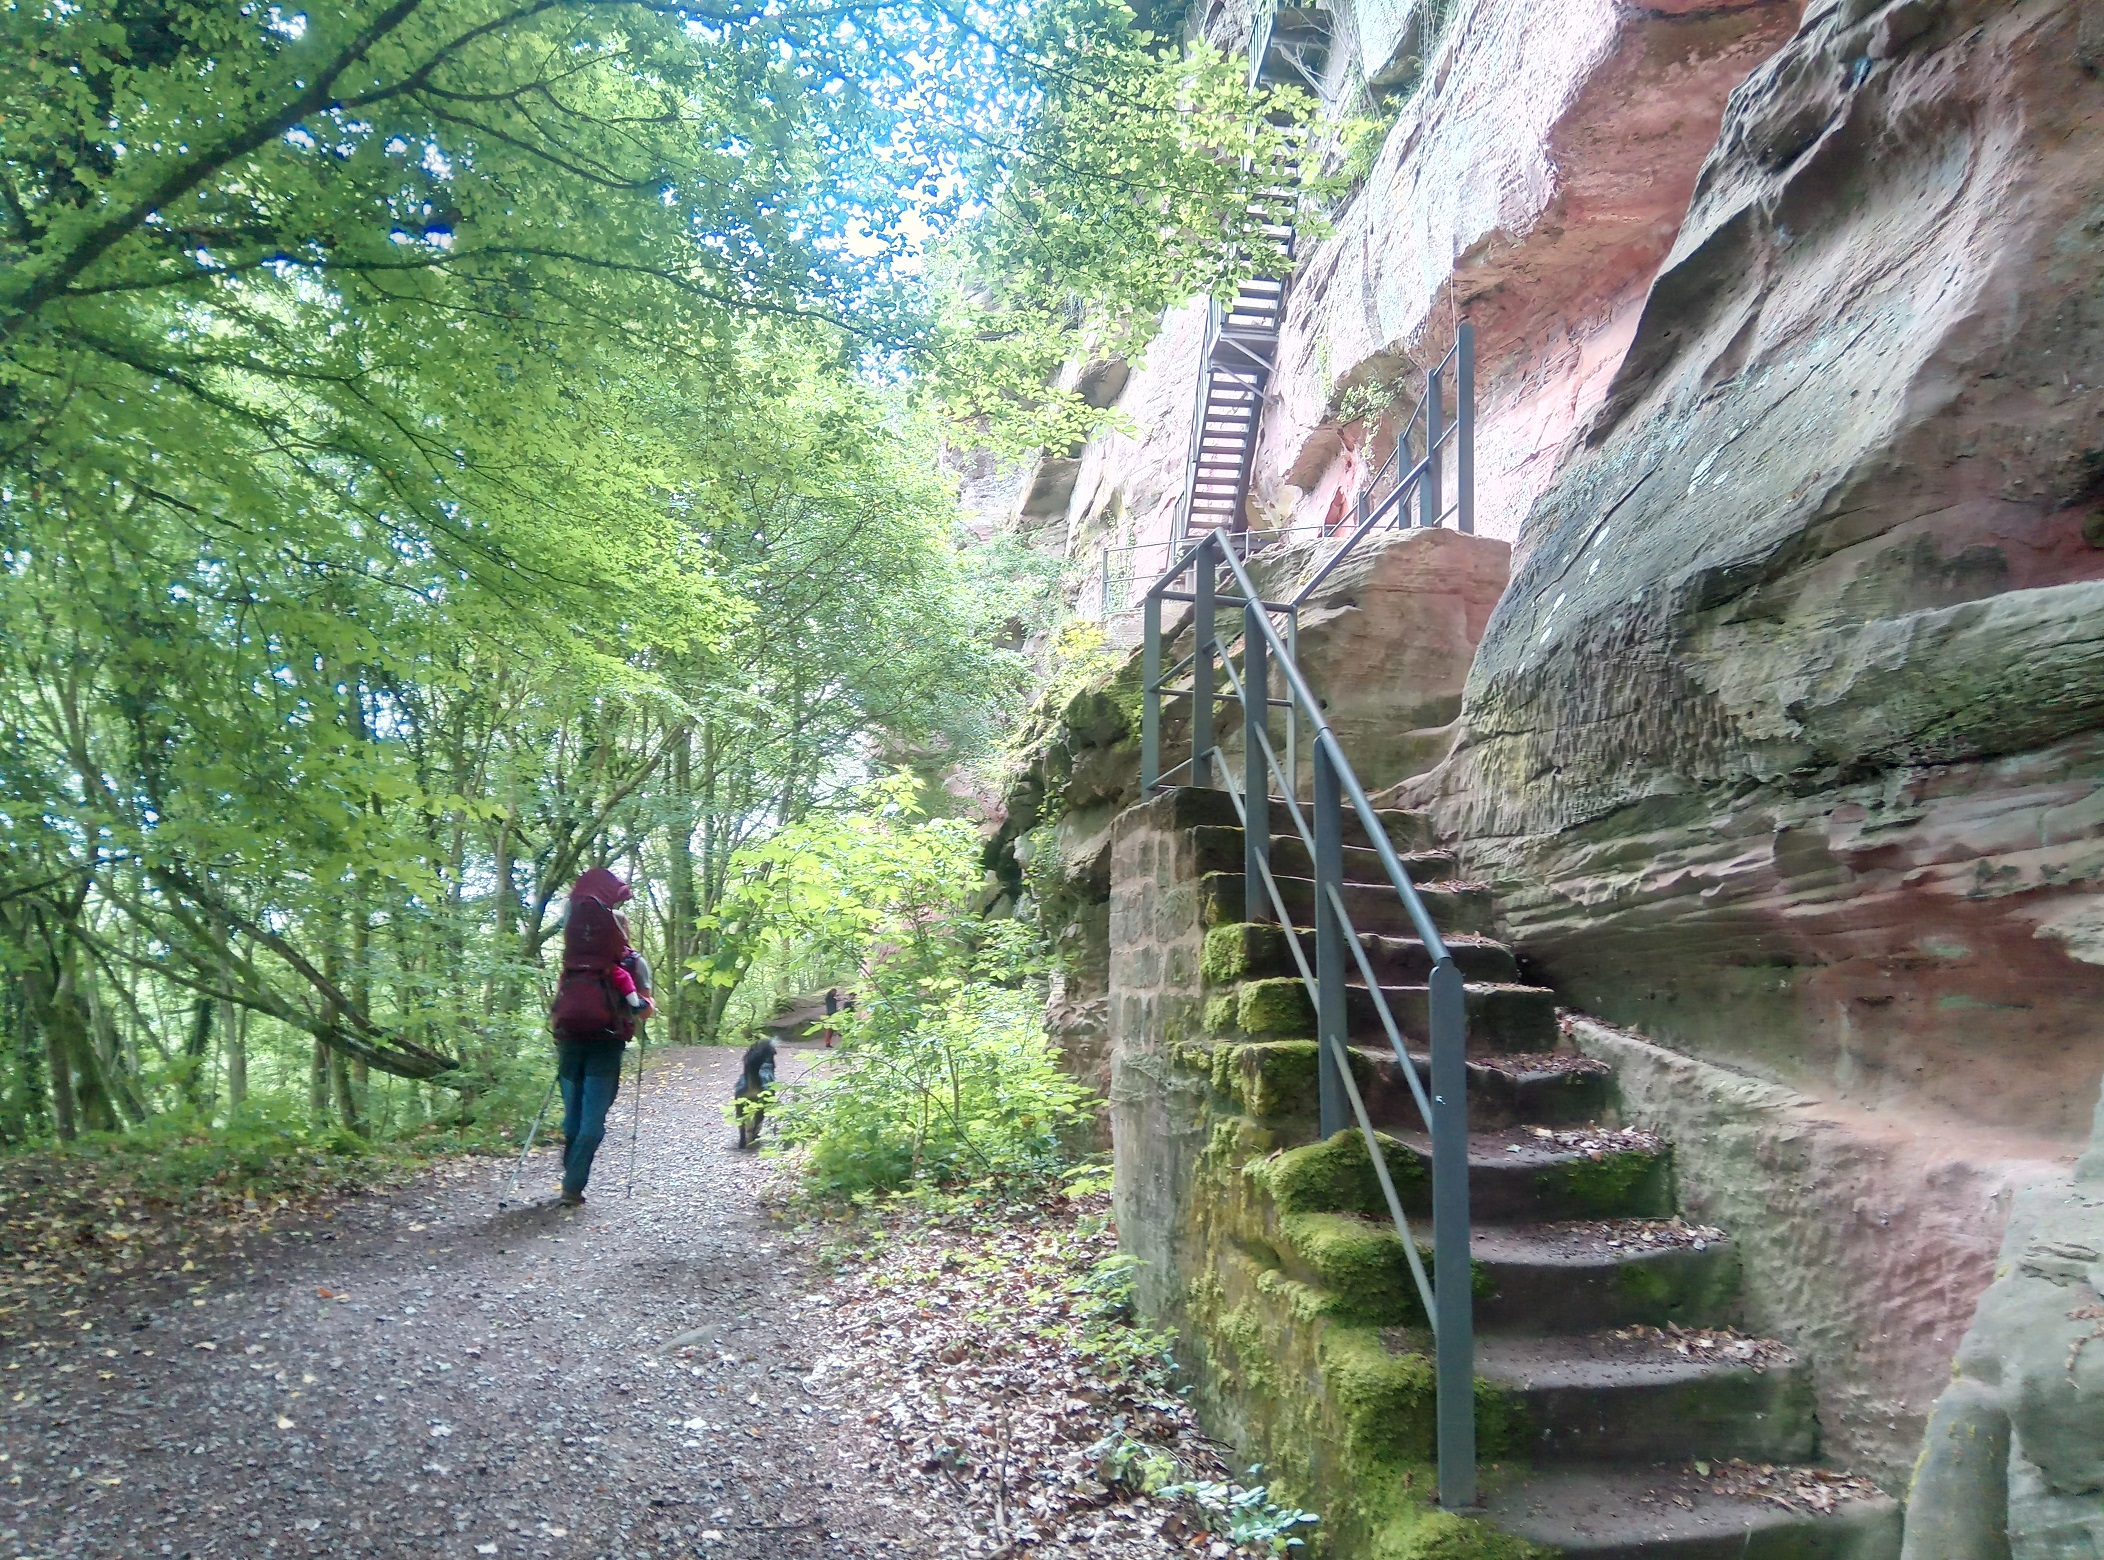 Wandertipp_Croissant_Wilgartswiesen_Falkenburg Aufgang